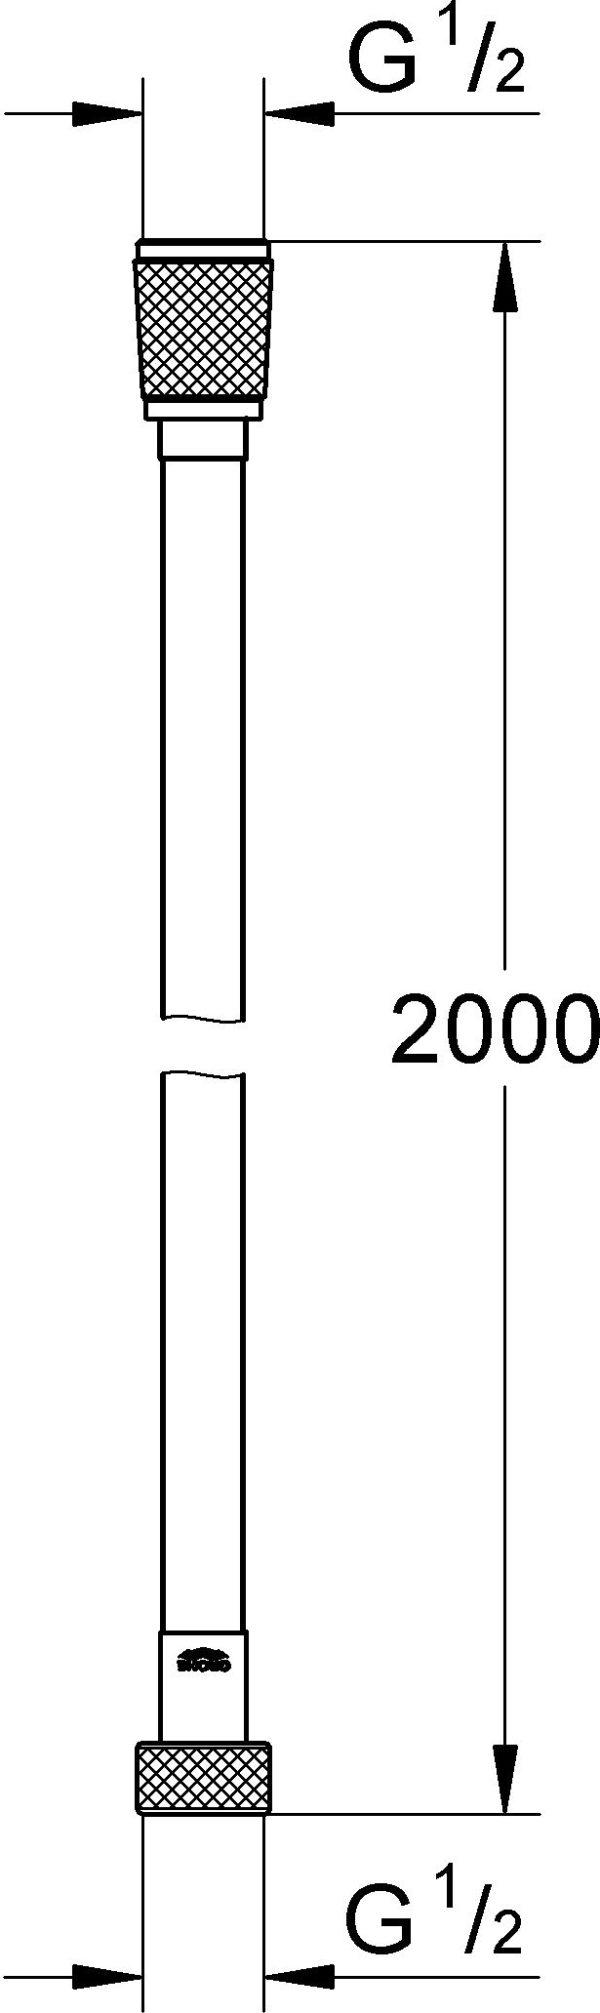 Душевой шланг Grohe Silverflex 27137000